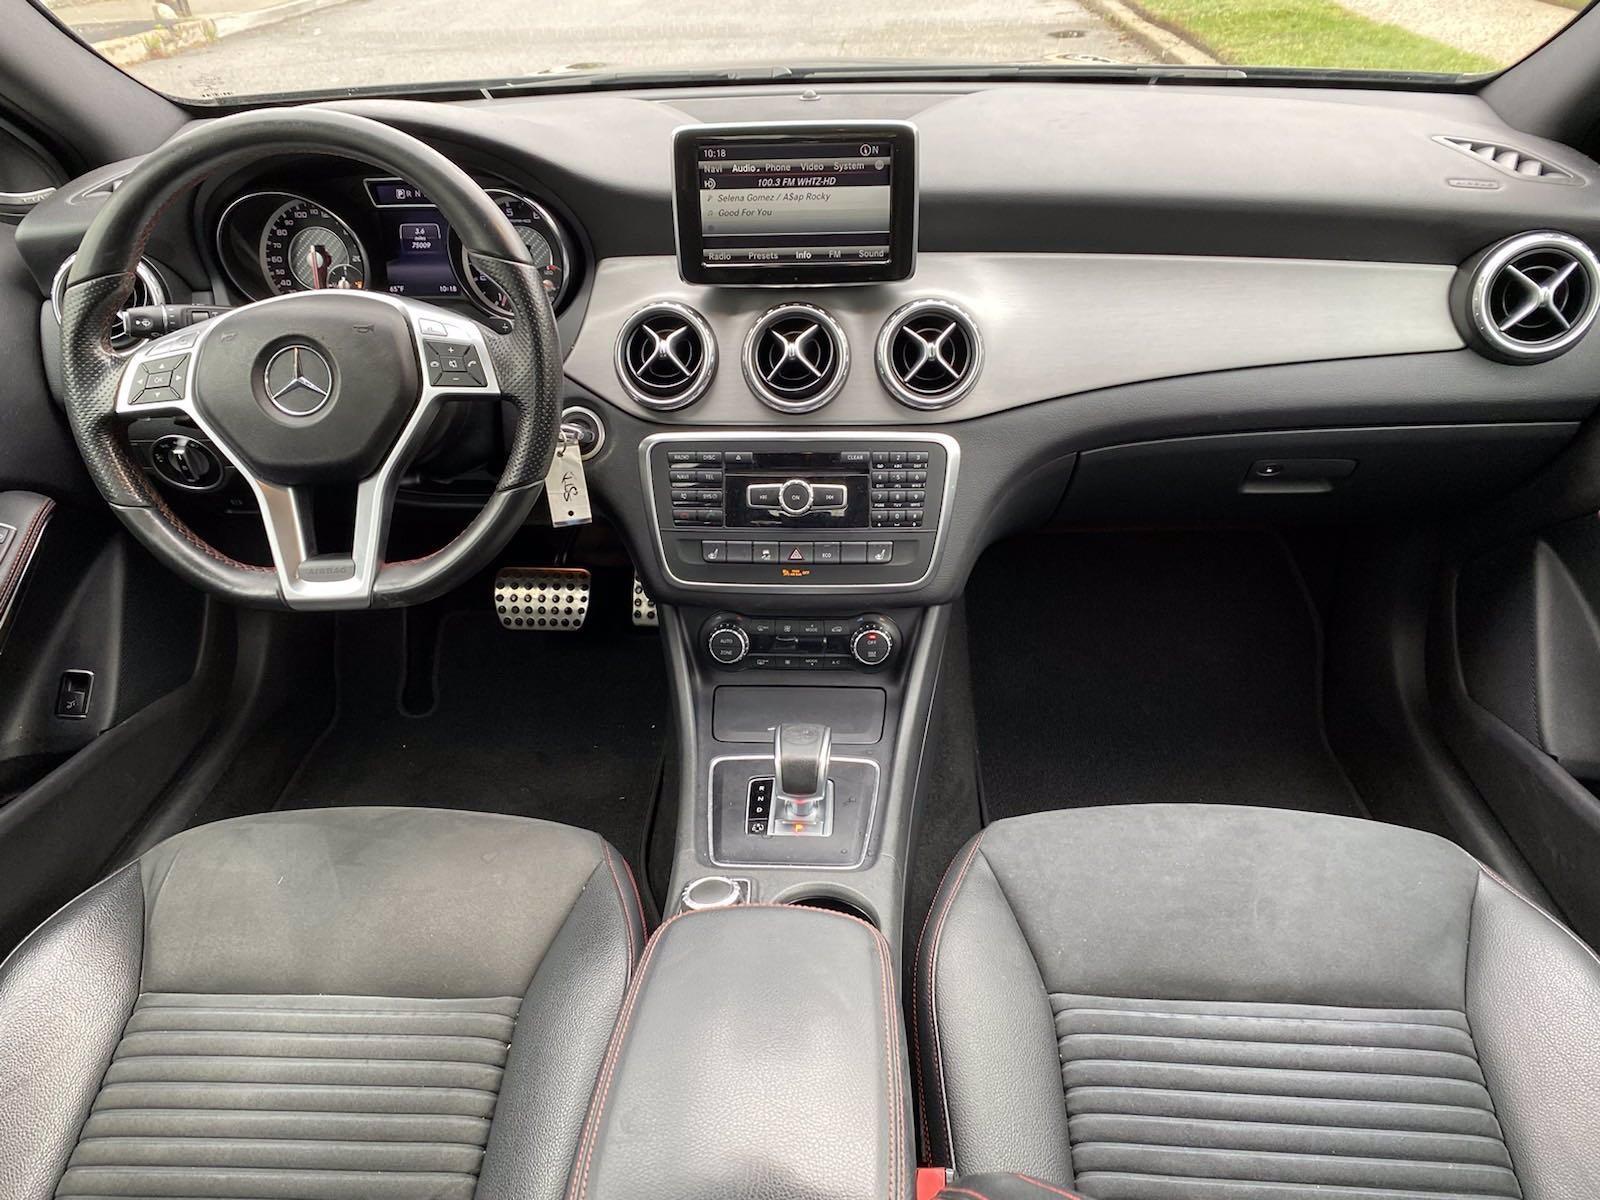 Used-2015-Mercedes-Benz-GLA-Class-GLA-45-AMG